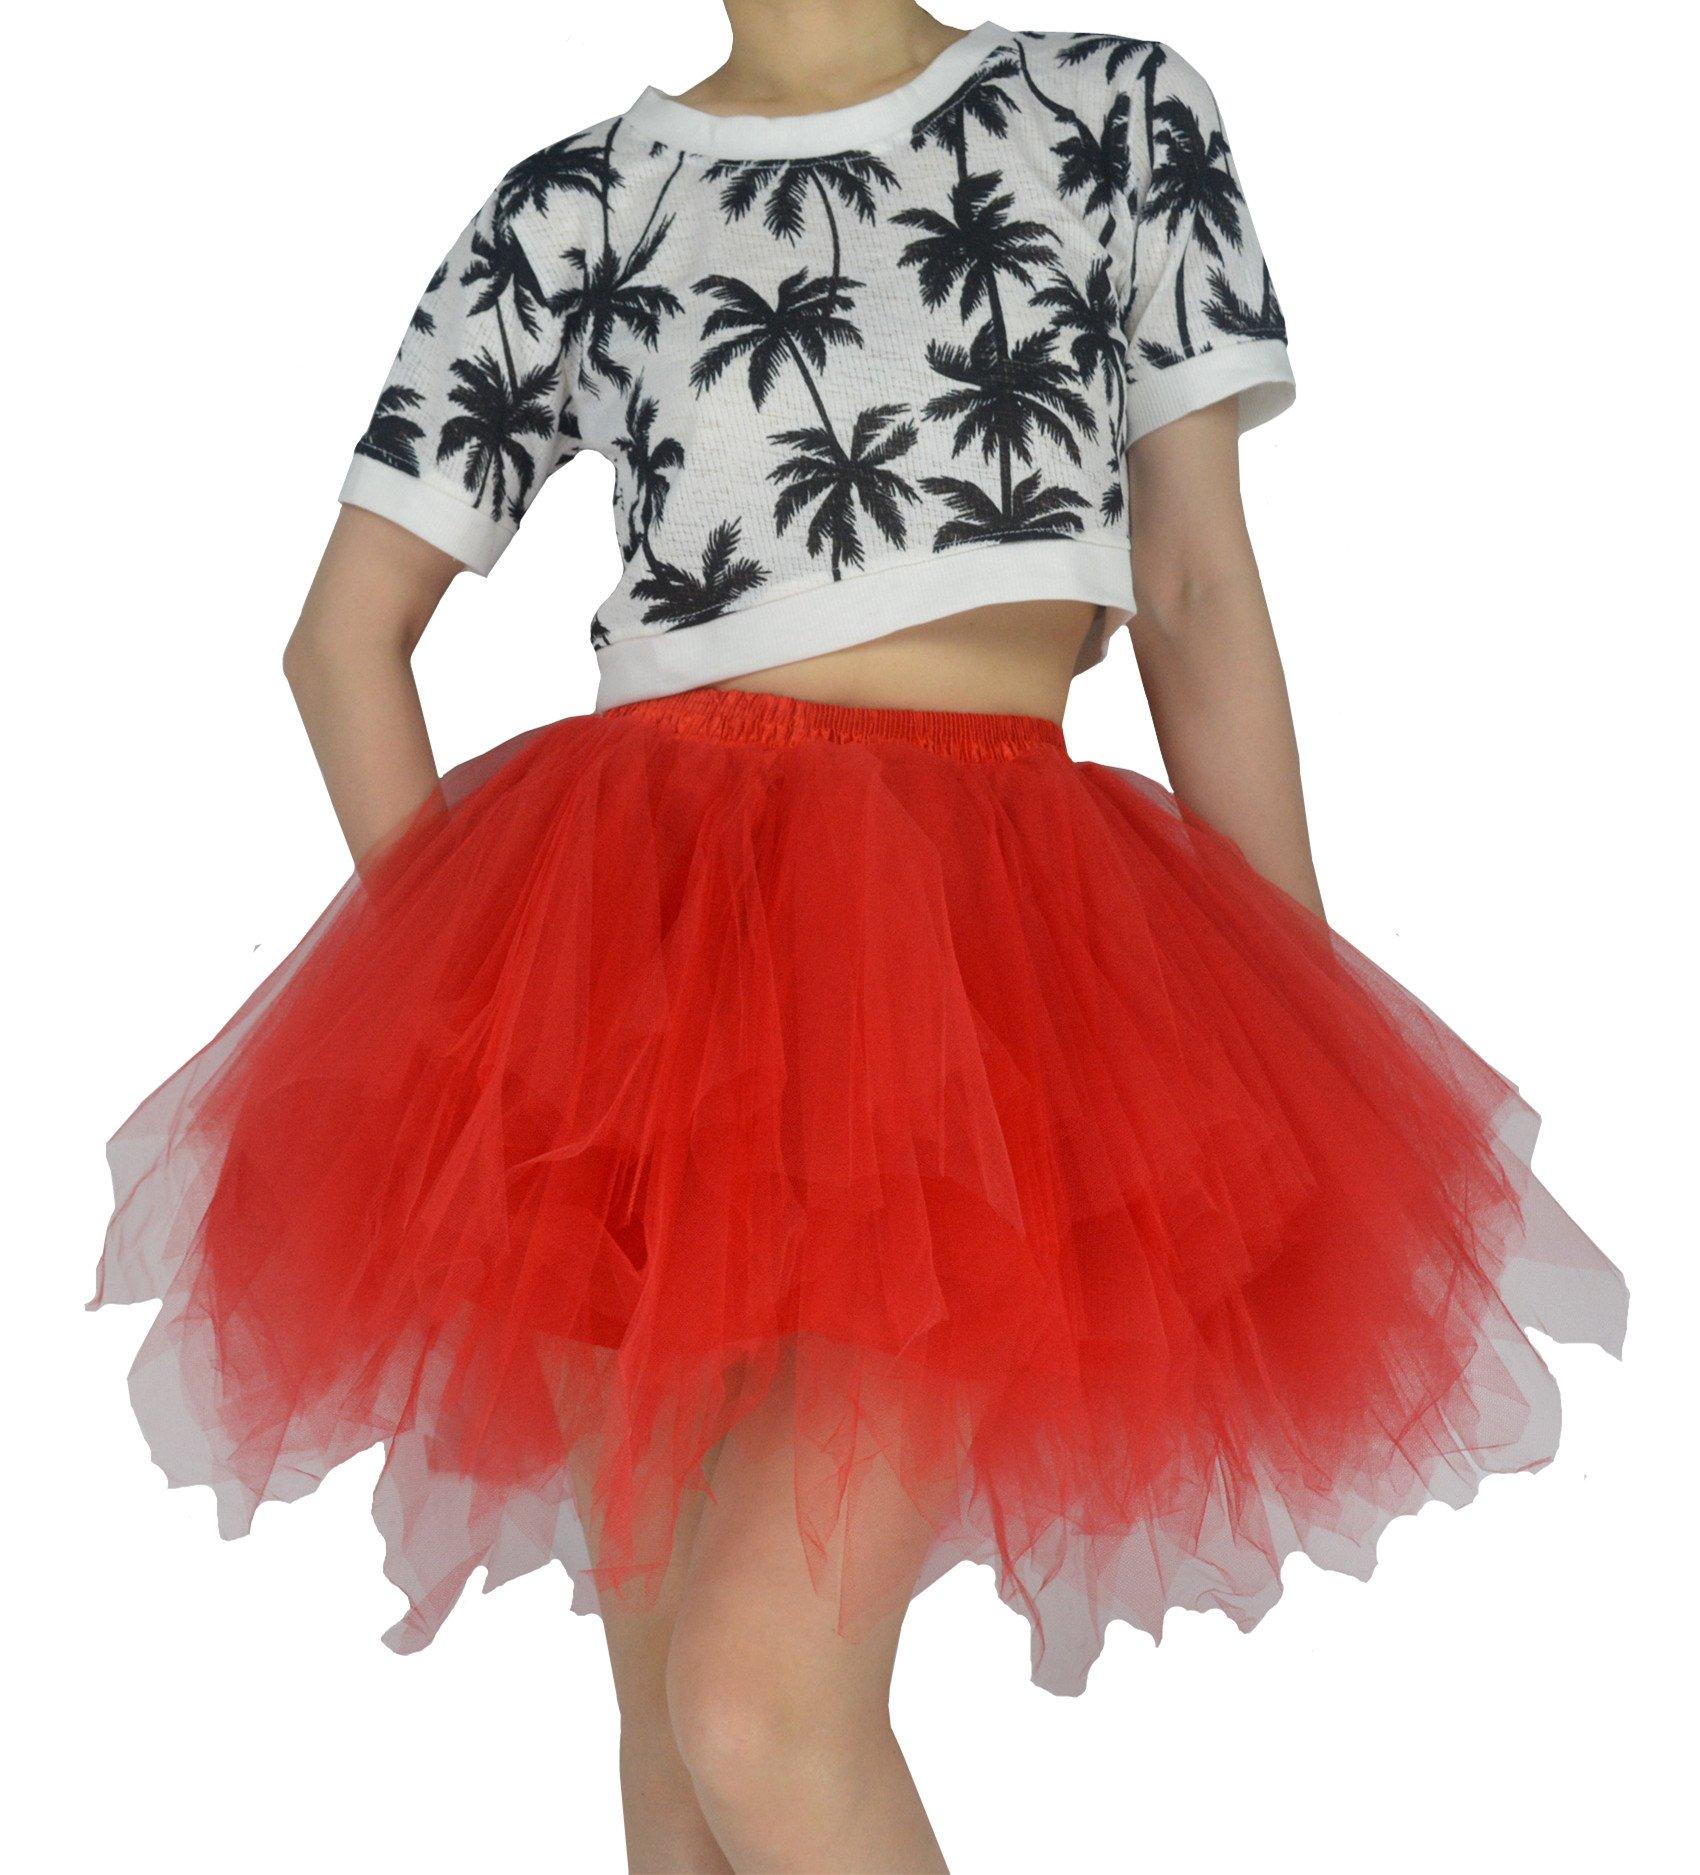 YSJERA Women's Tutu Tulle Mini A-Line Petticoat Prom Party Cosplay Skirt Fun Skirts (M, Red) by YSJERA